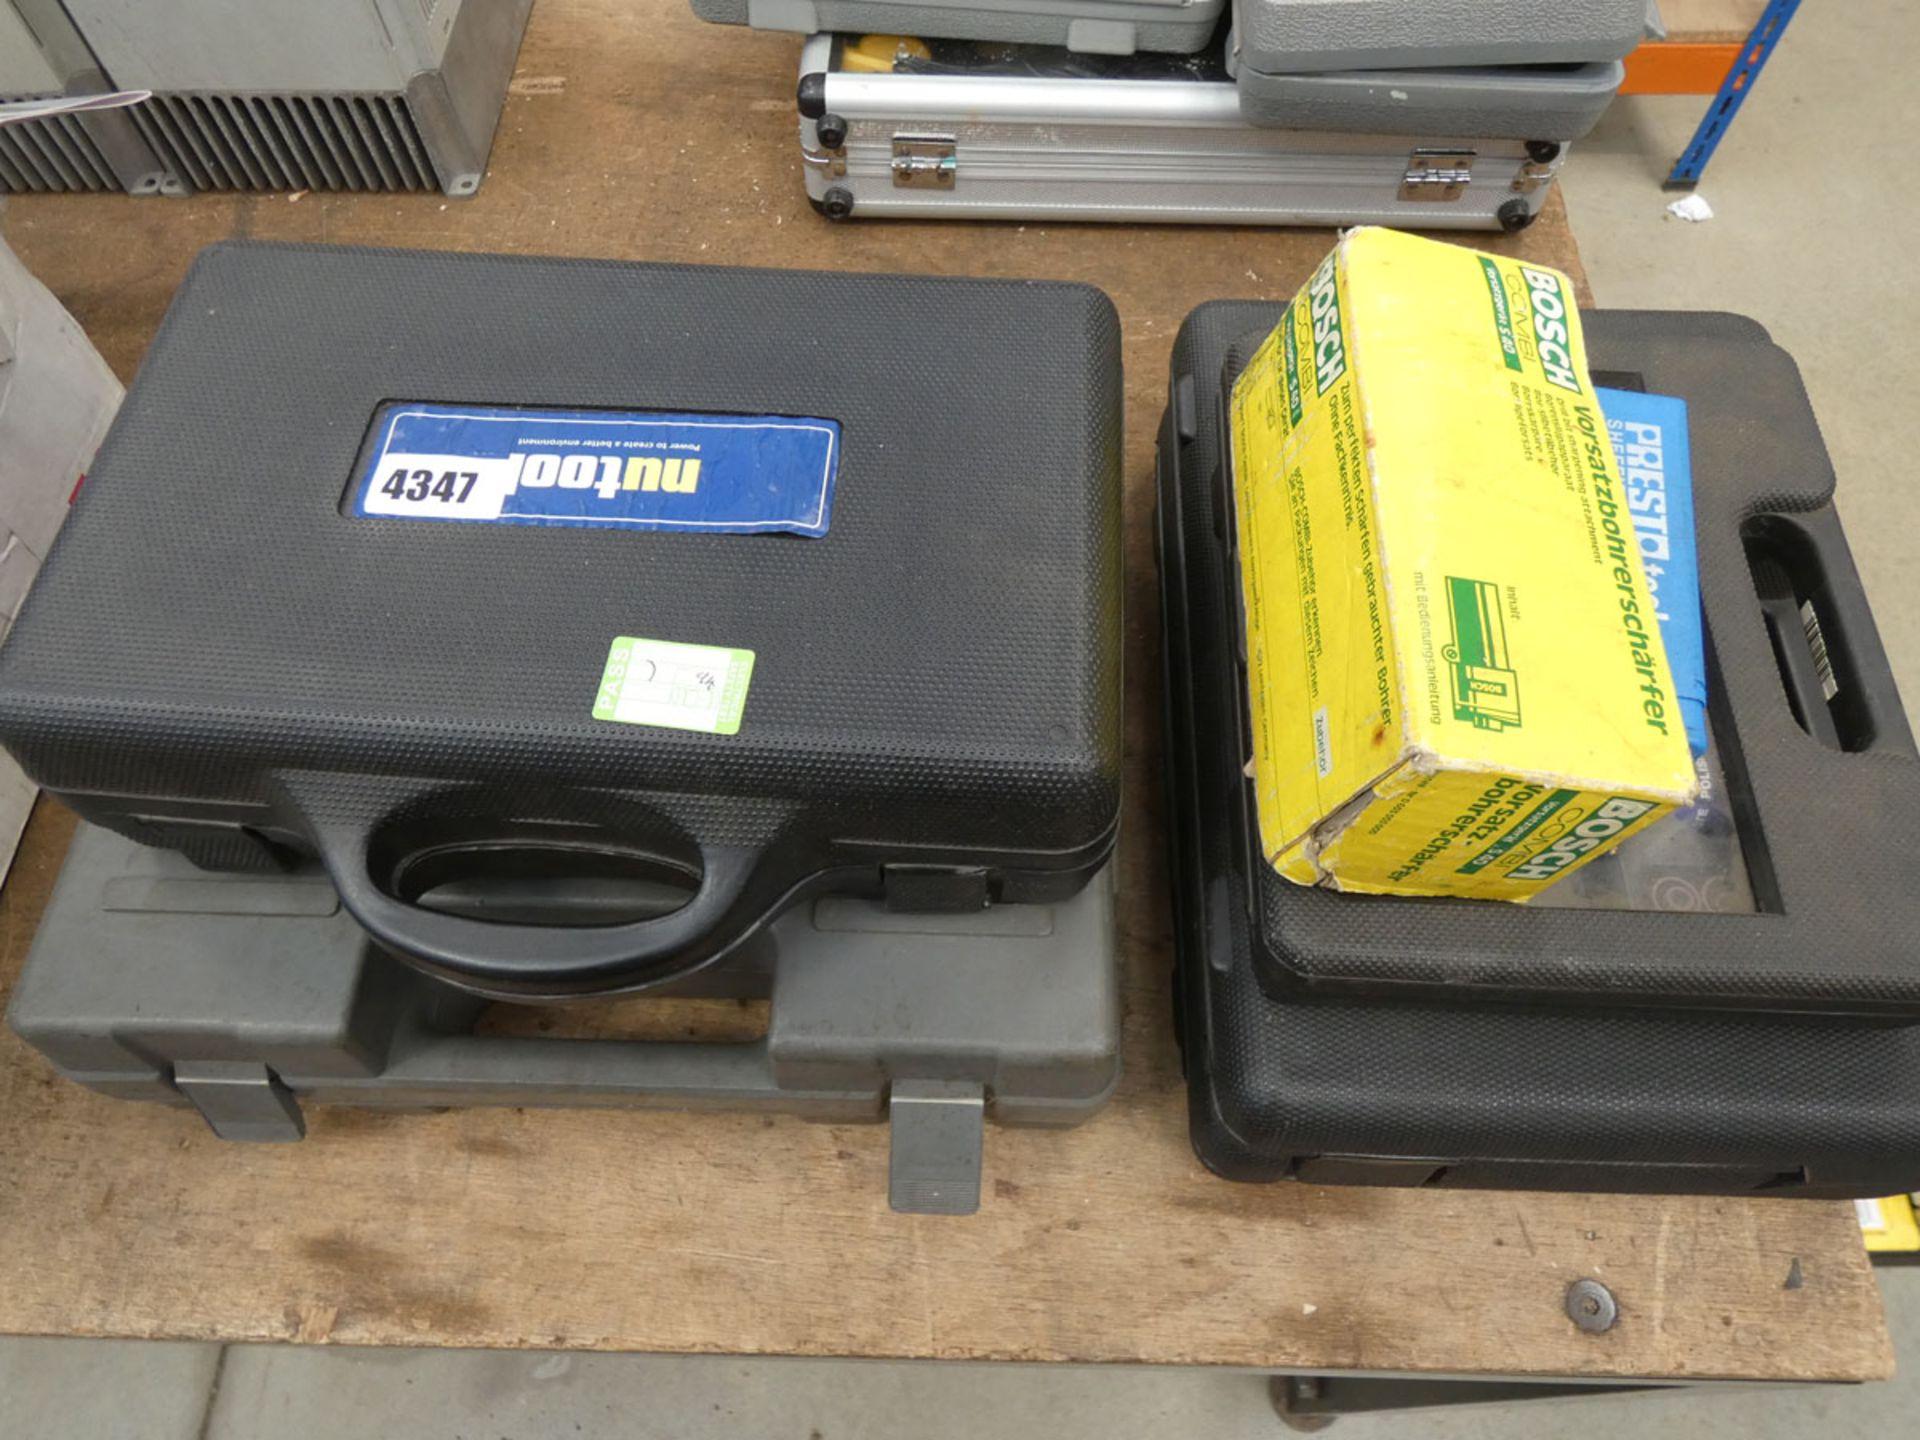 Newtool screwdriver set, Bosch drill, mini grinding heads and a drill bit set